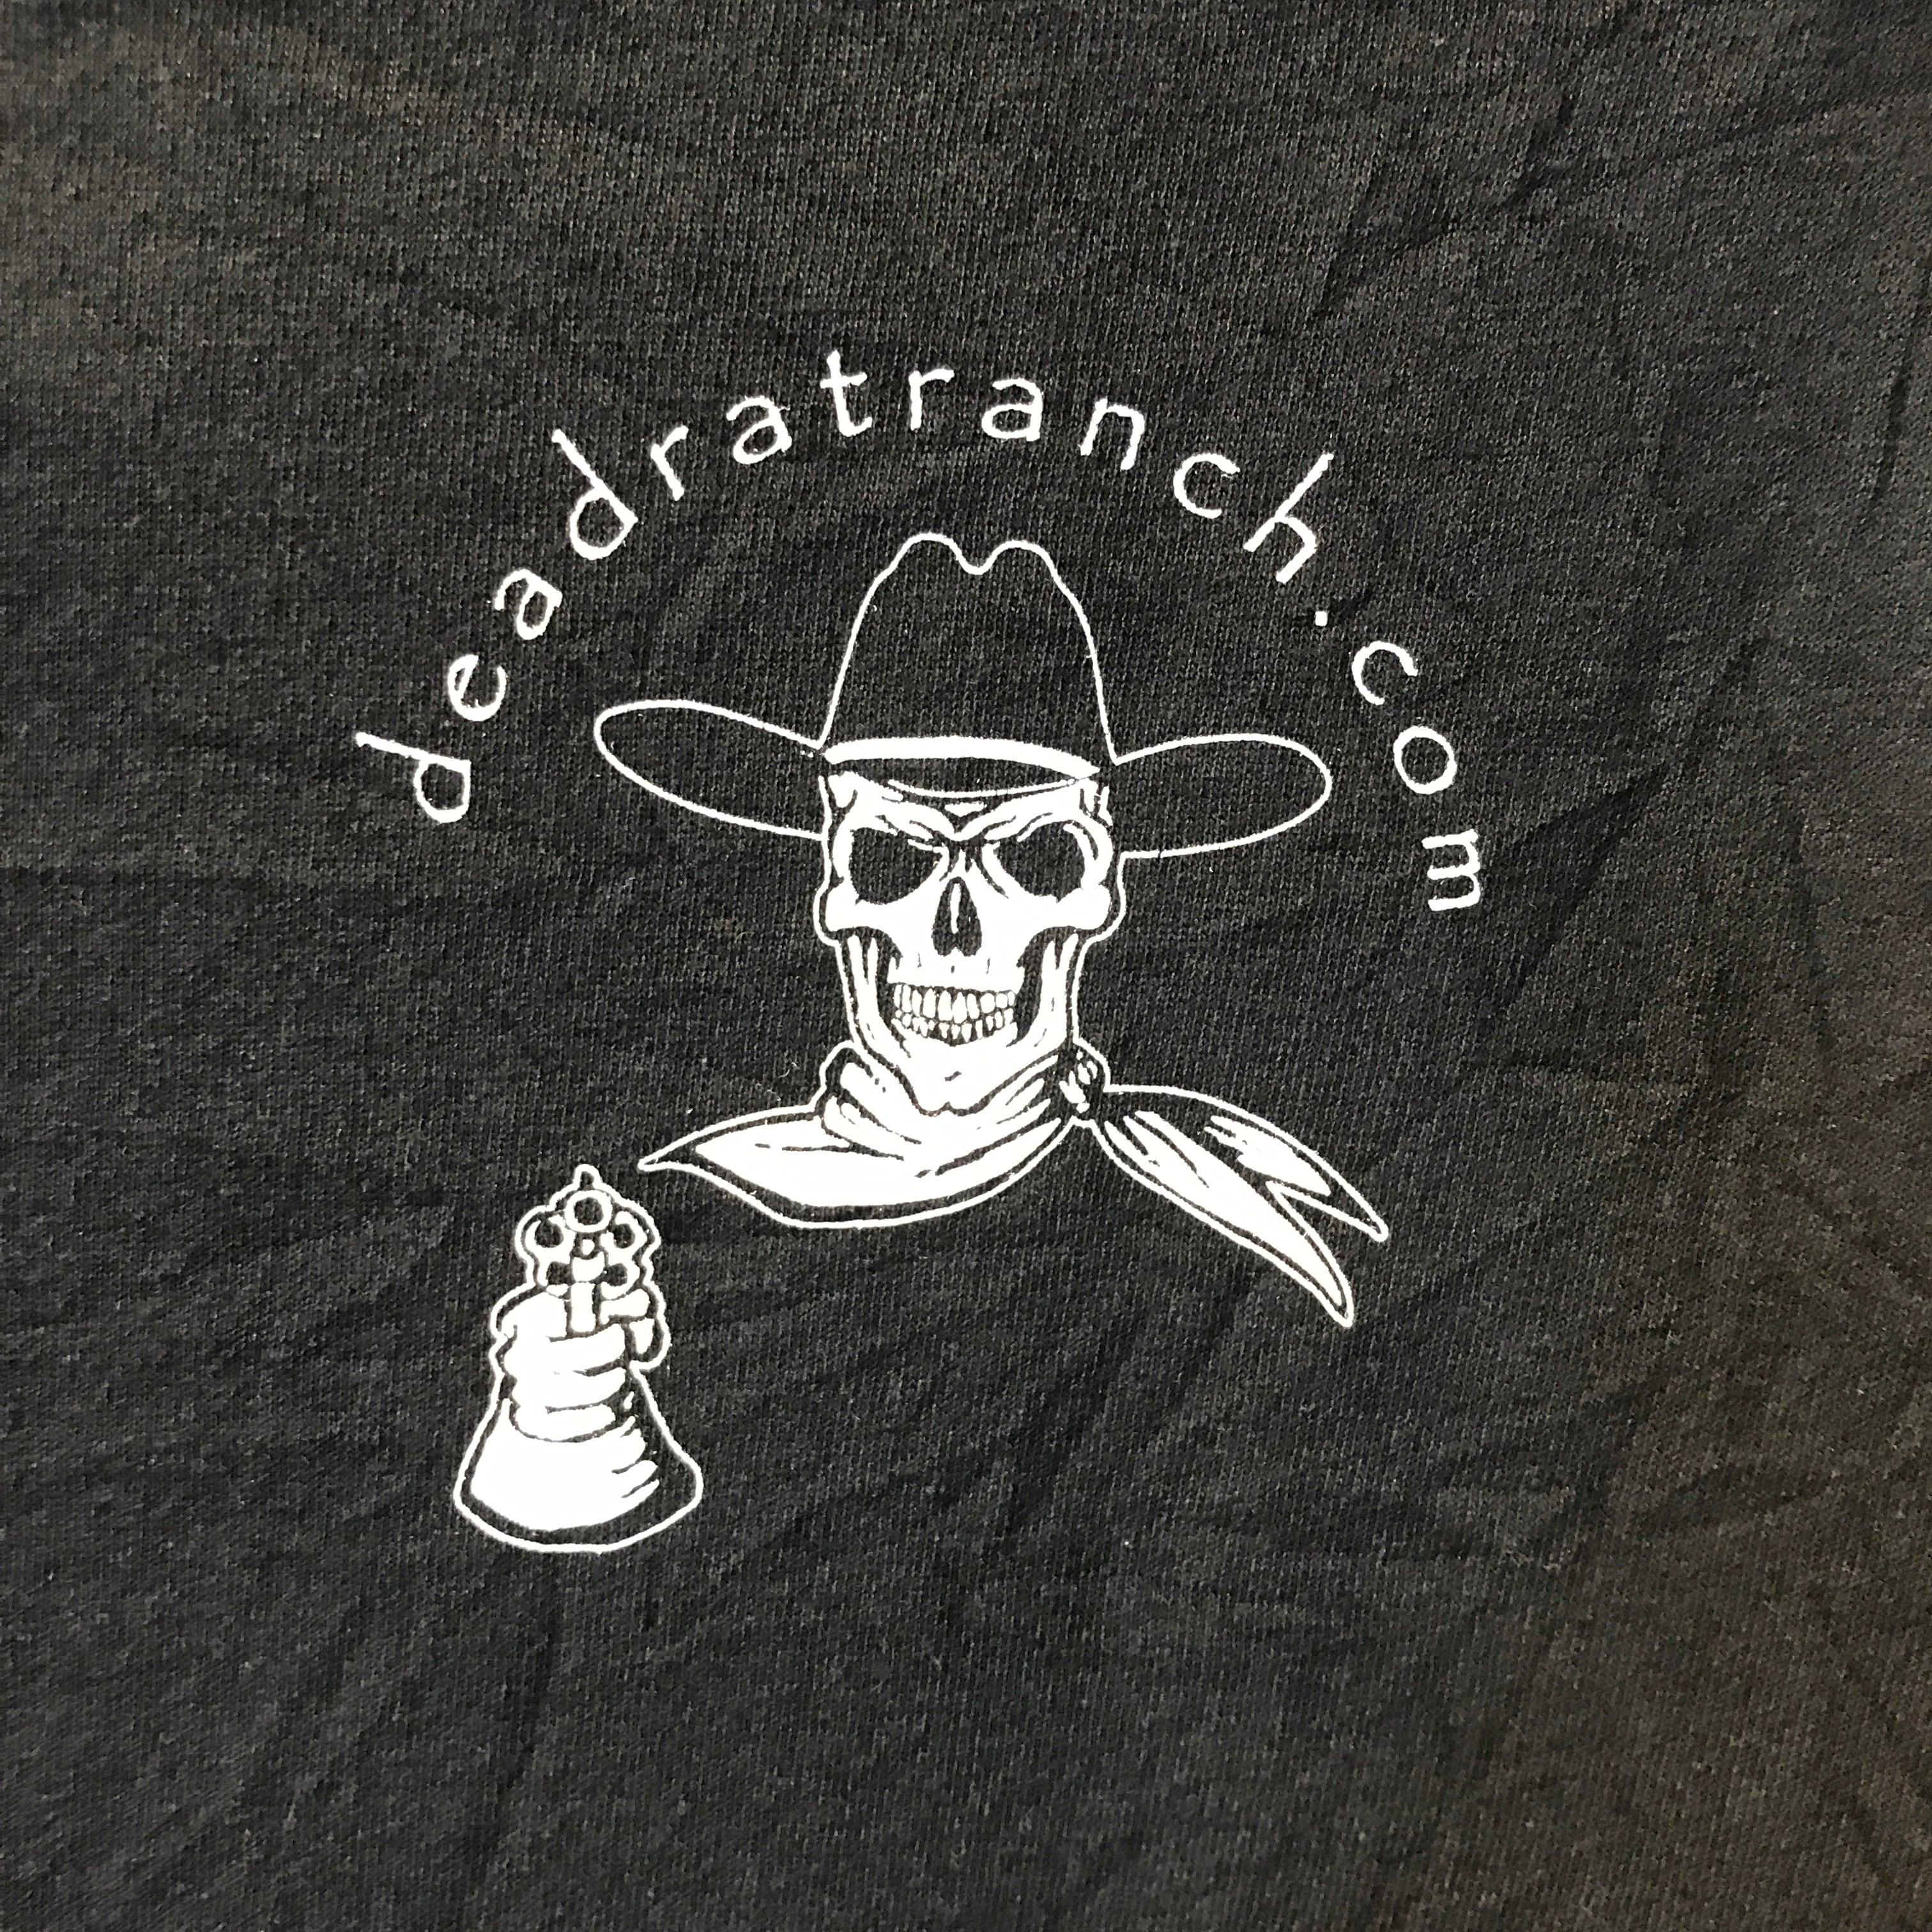 【Used】deadratranch Tee